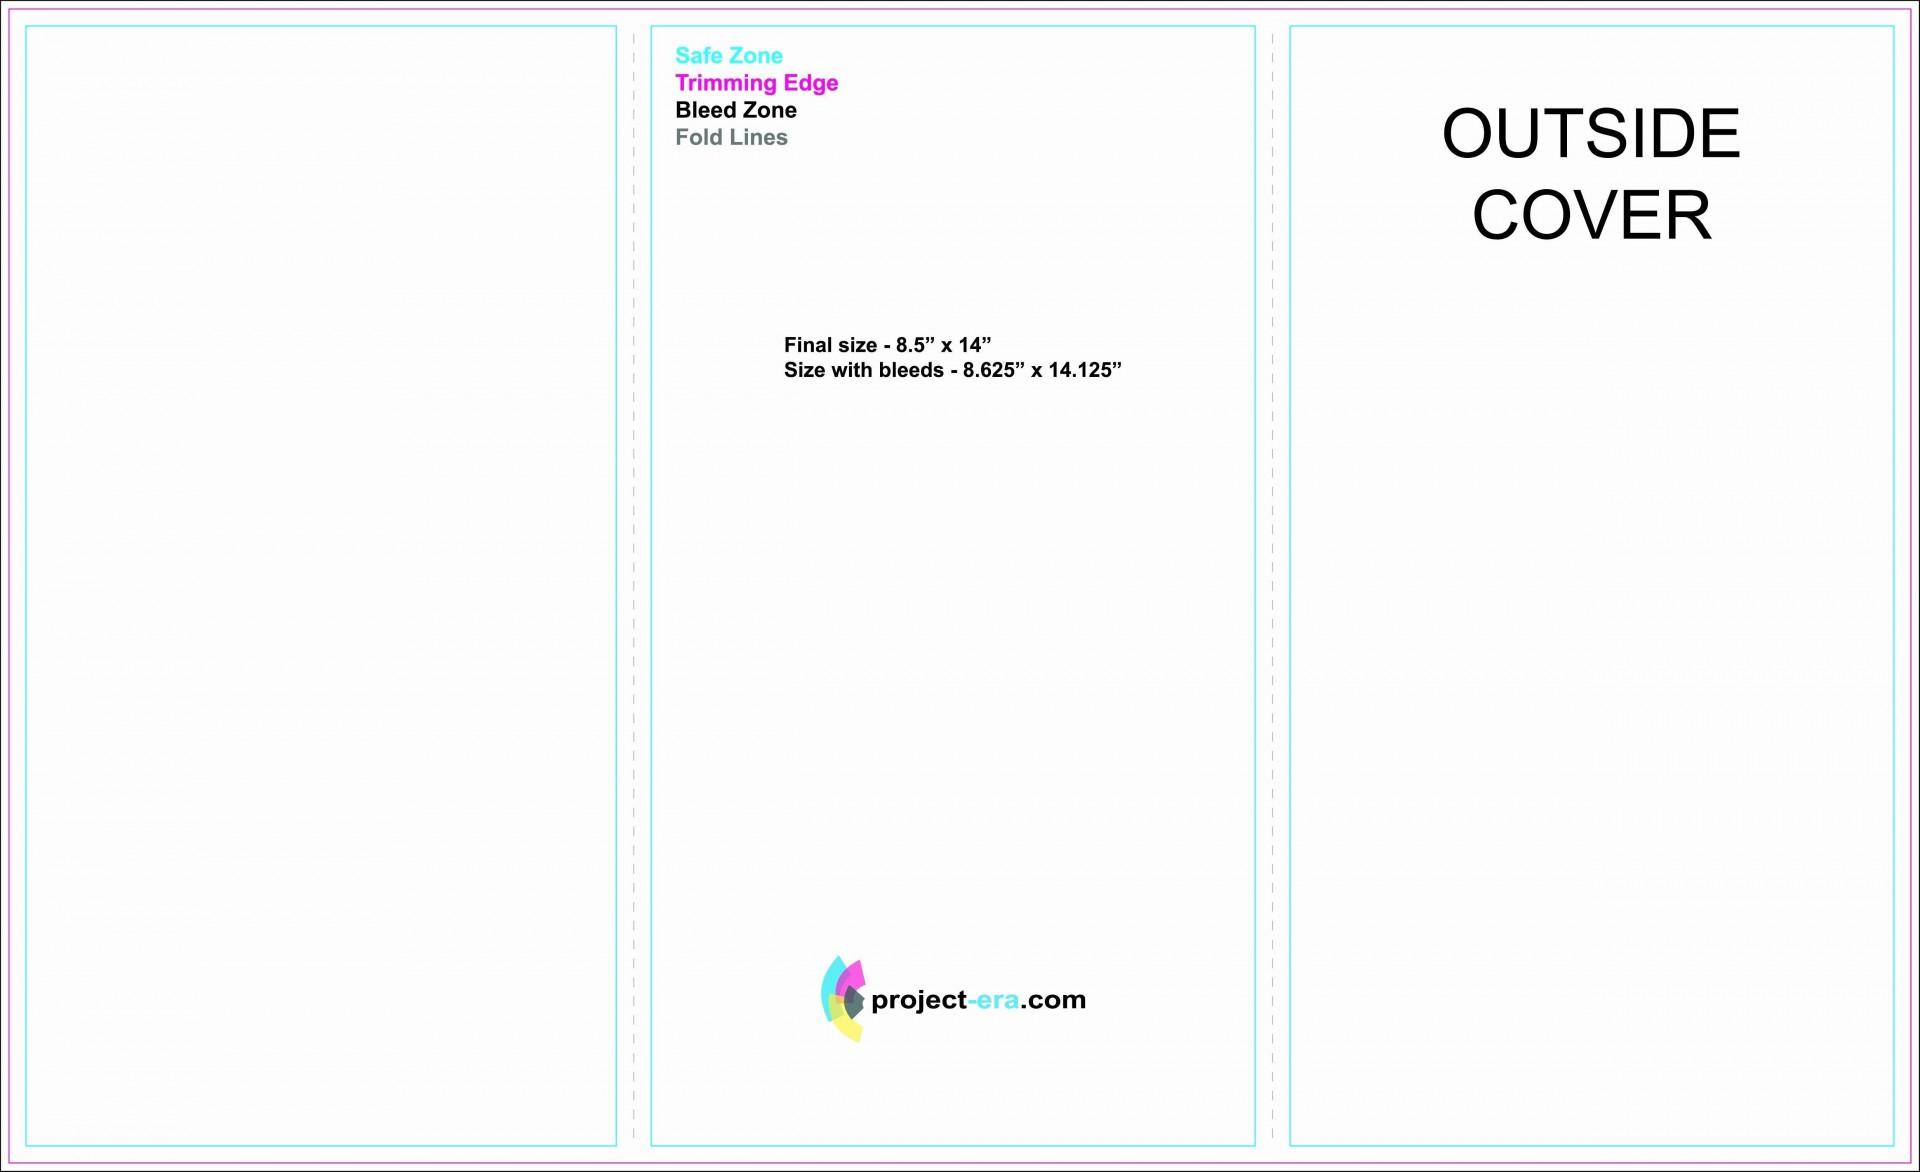 002 Simple Tri Fold Template Google Doc Sample  Docs Brochure Free Pamphlet Blank Slide1920